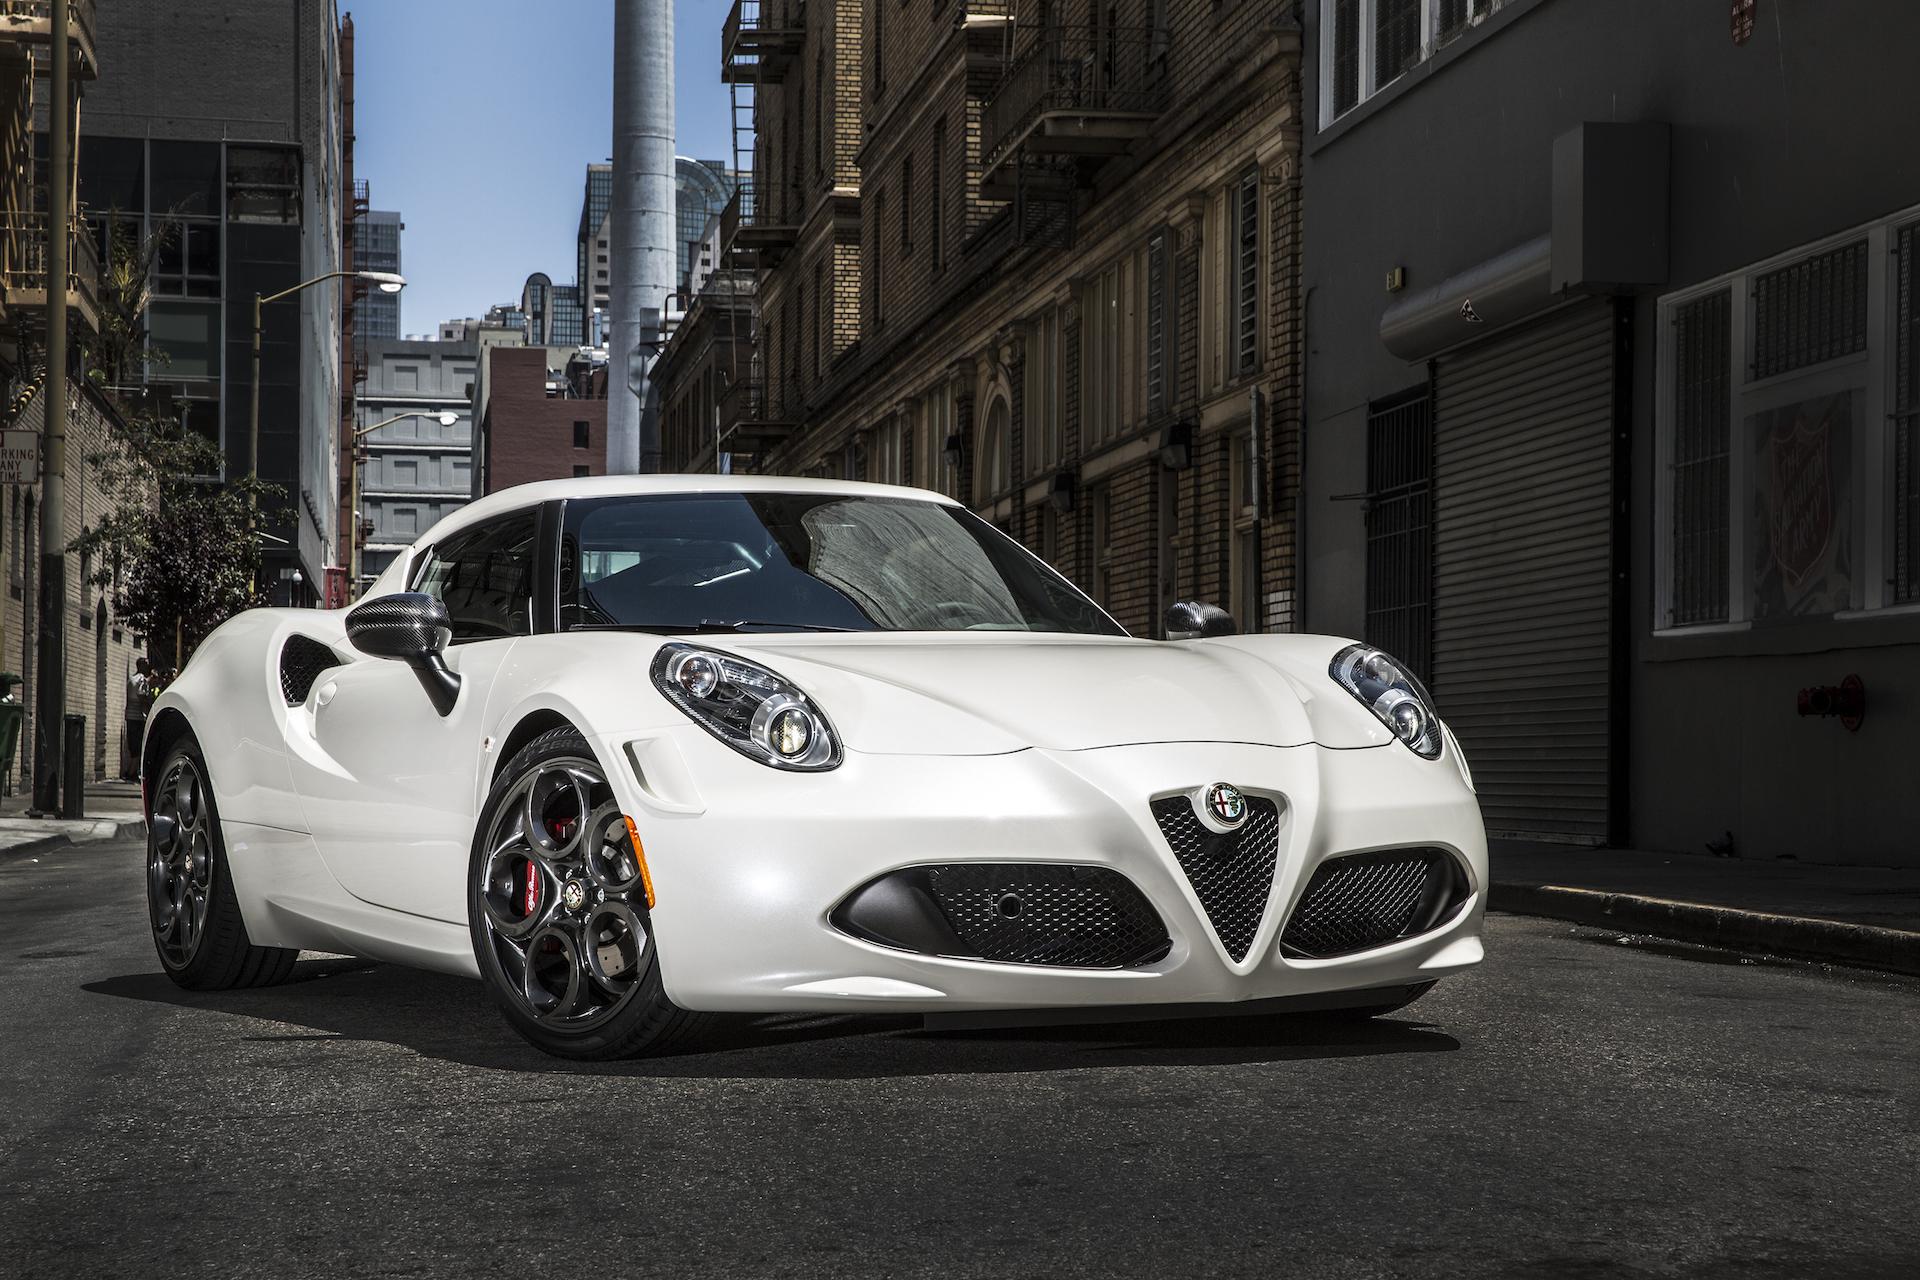 2015 alfa romeo 4c: motor authority's best car to buy 2015